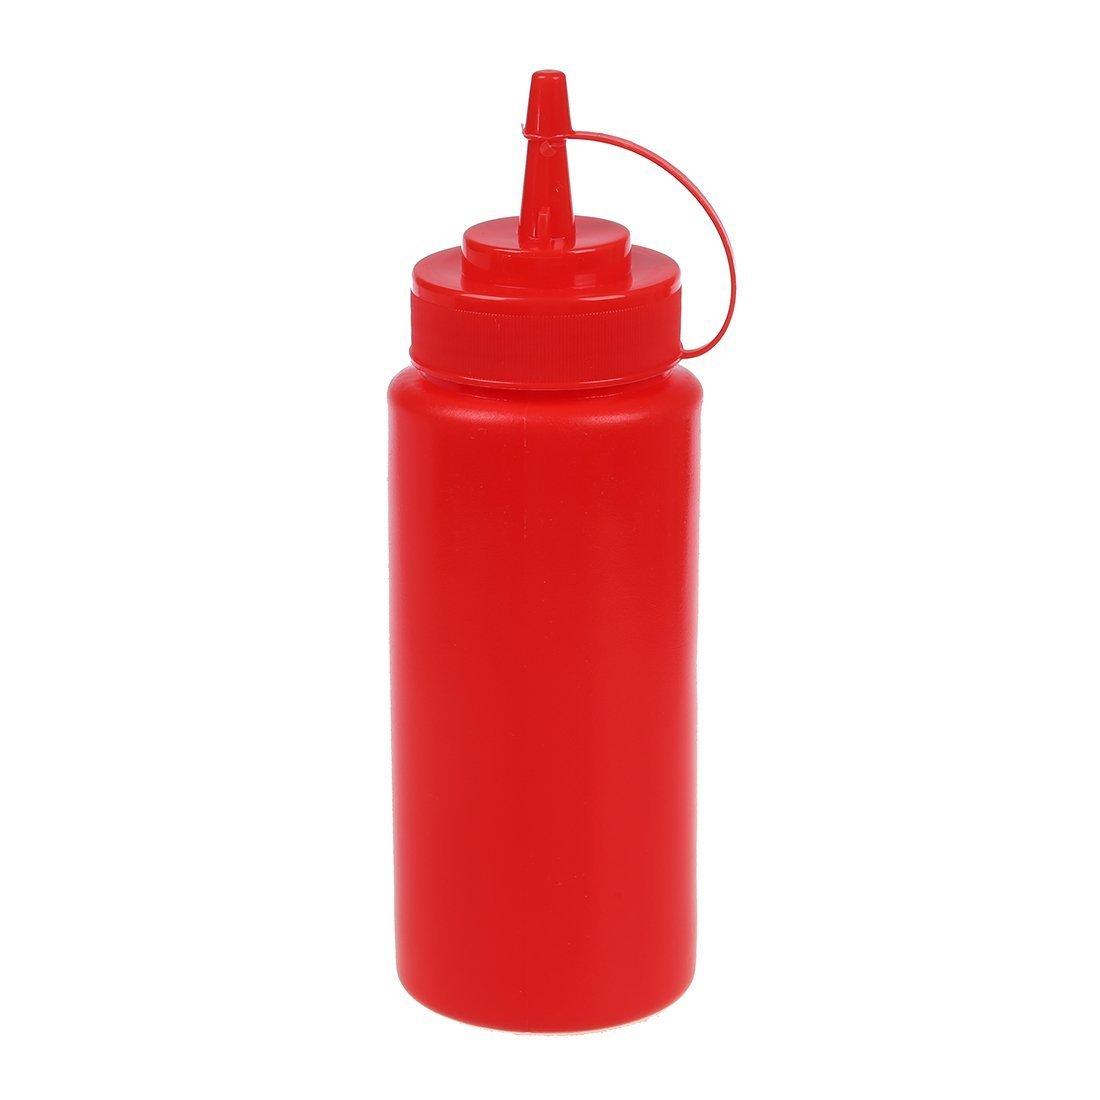 bottiglie di salsa - SODIAL(R) 16 once Plastica da cucina salsa di dispenser di compressione bottiglia - Rosso TRTA11A